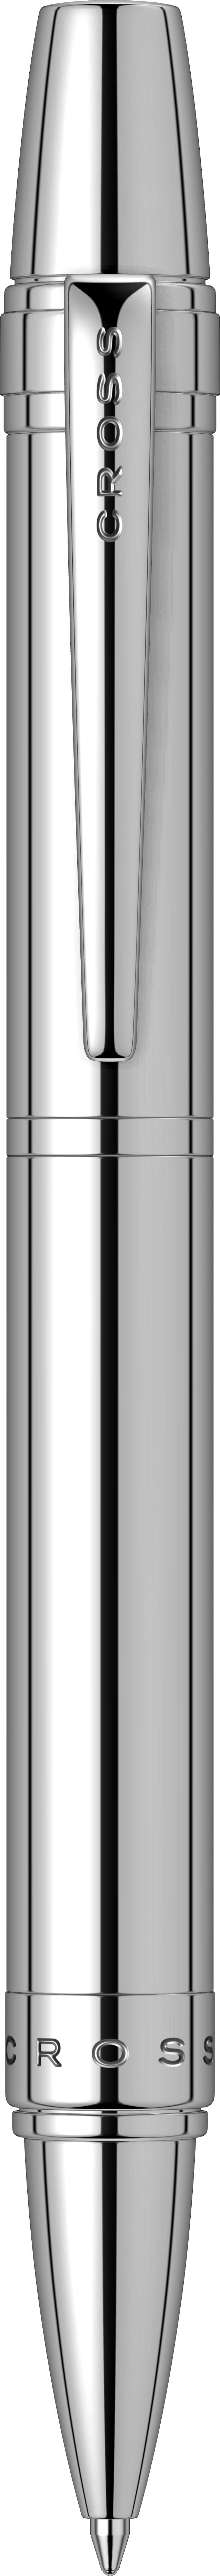 Chrome CT-897